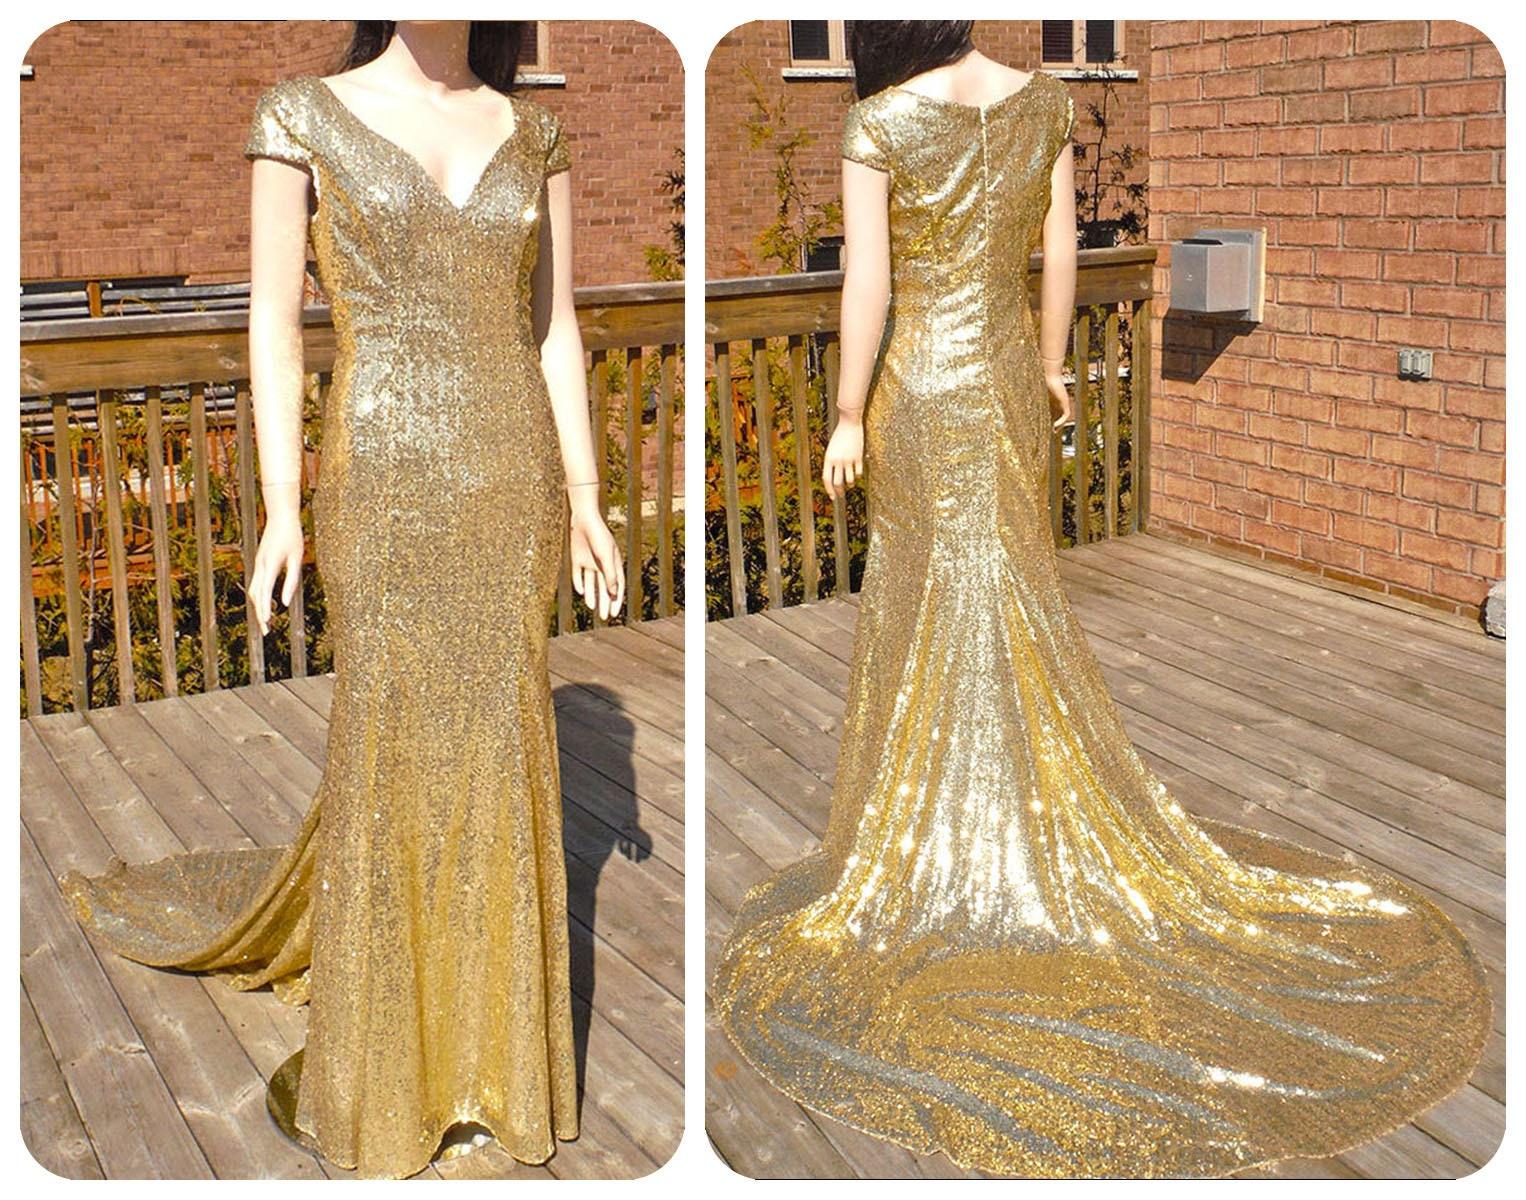 Bridesmaid dress, gold sequin bridesmaid dresses, gold sequin dress, gold wedding dress, sequin wedding dress